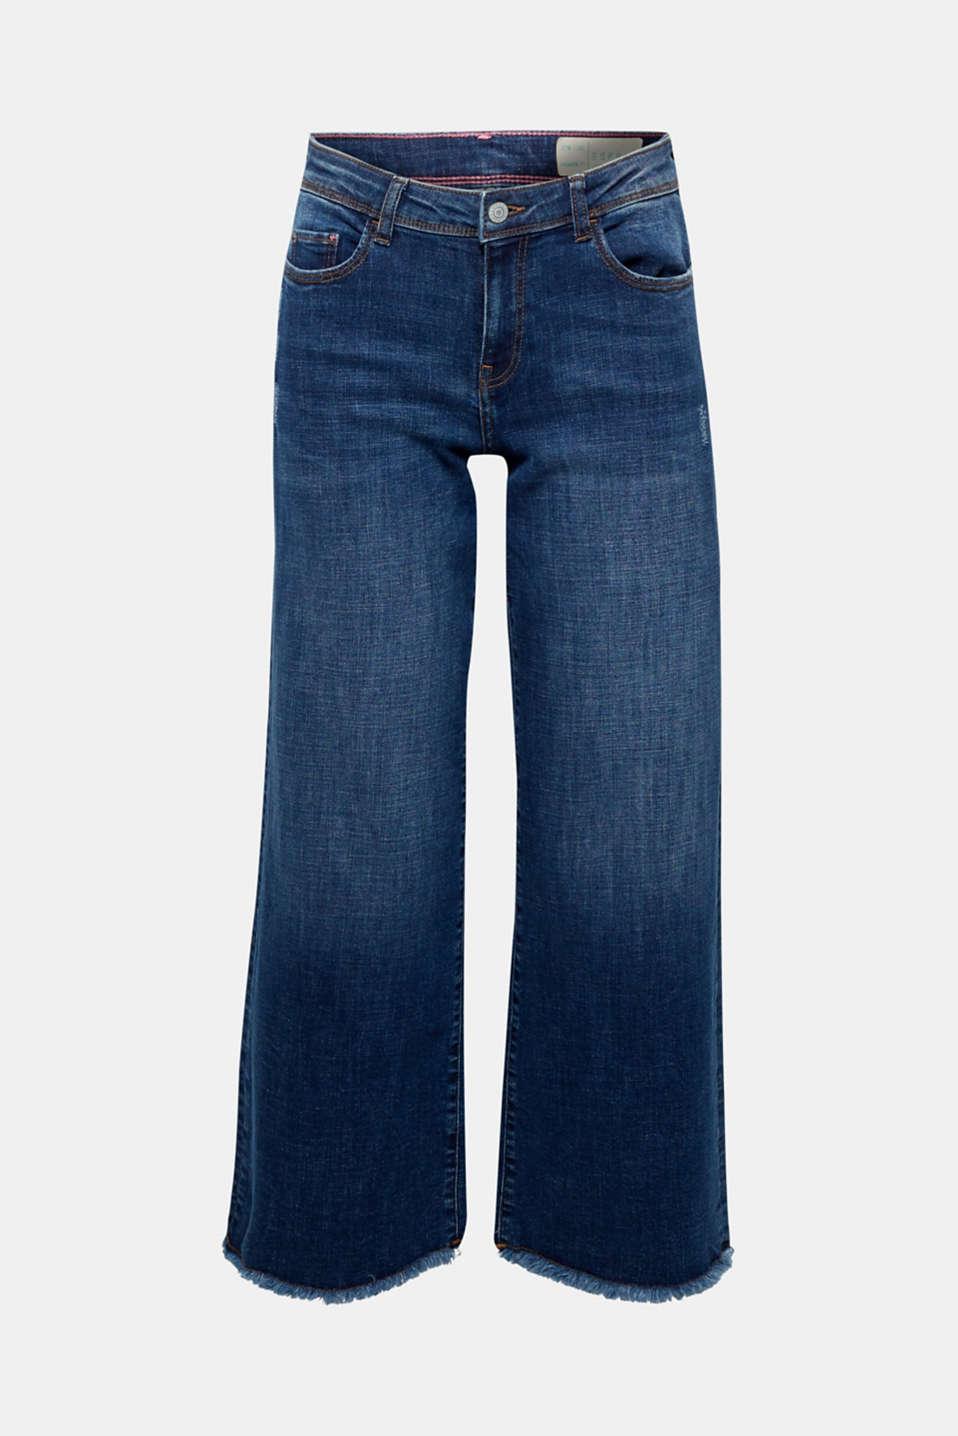 Pants denim, BLUE MEDIUM WASH, detail image number 6